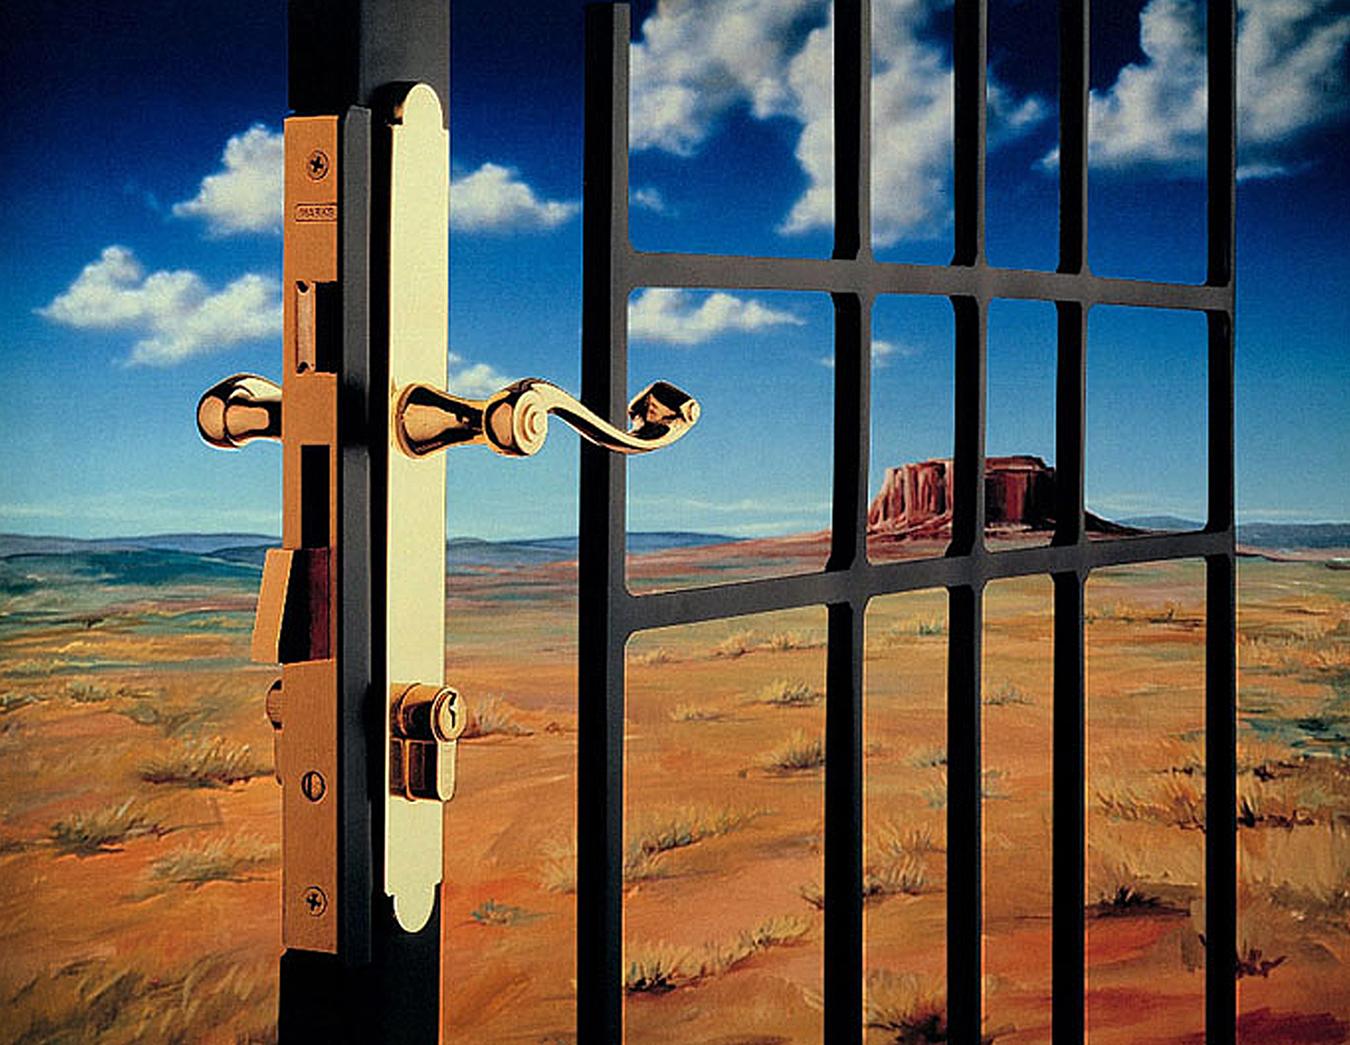 Tony_Ward_early_photography_surrealism_doorway_gates_locks_desert_landscape